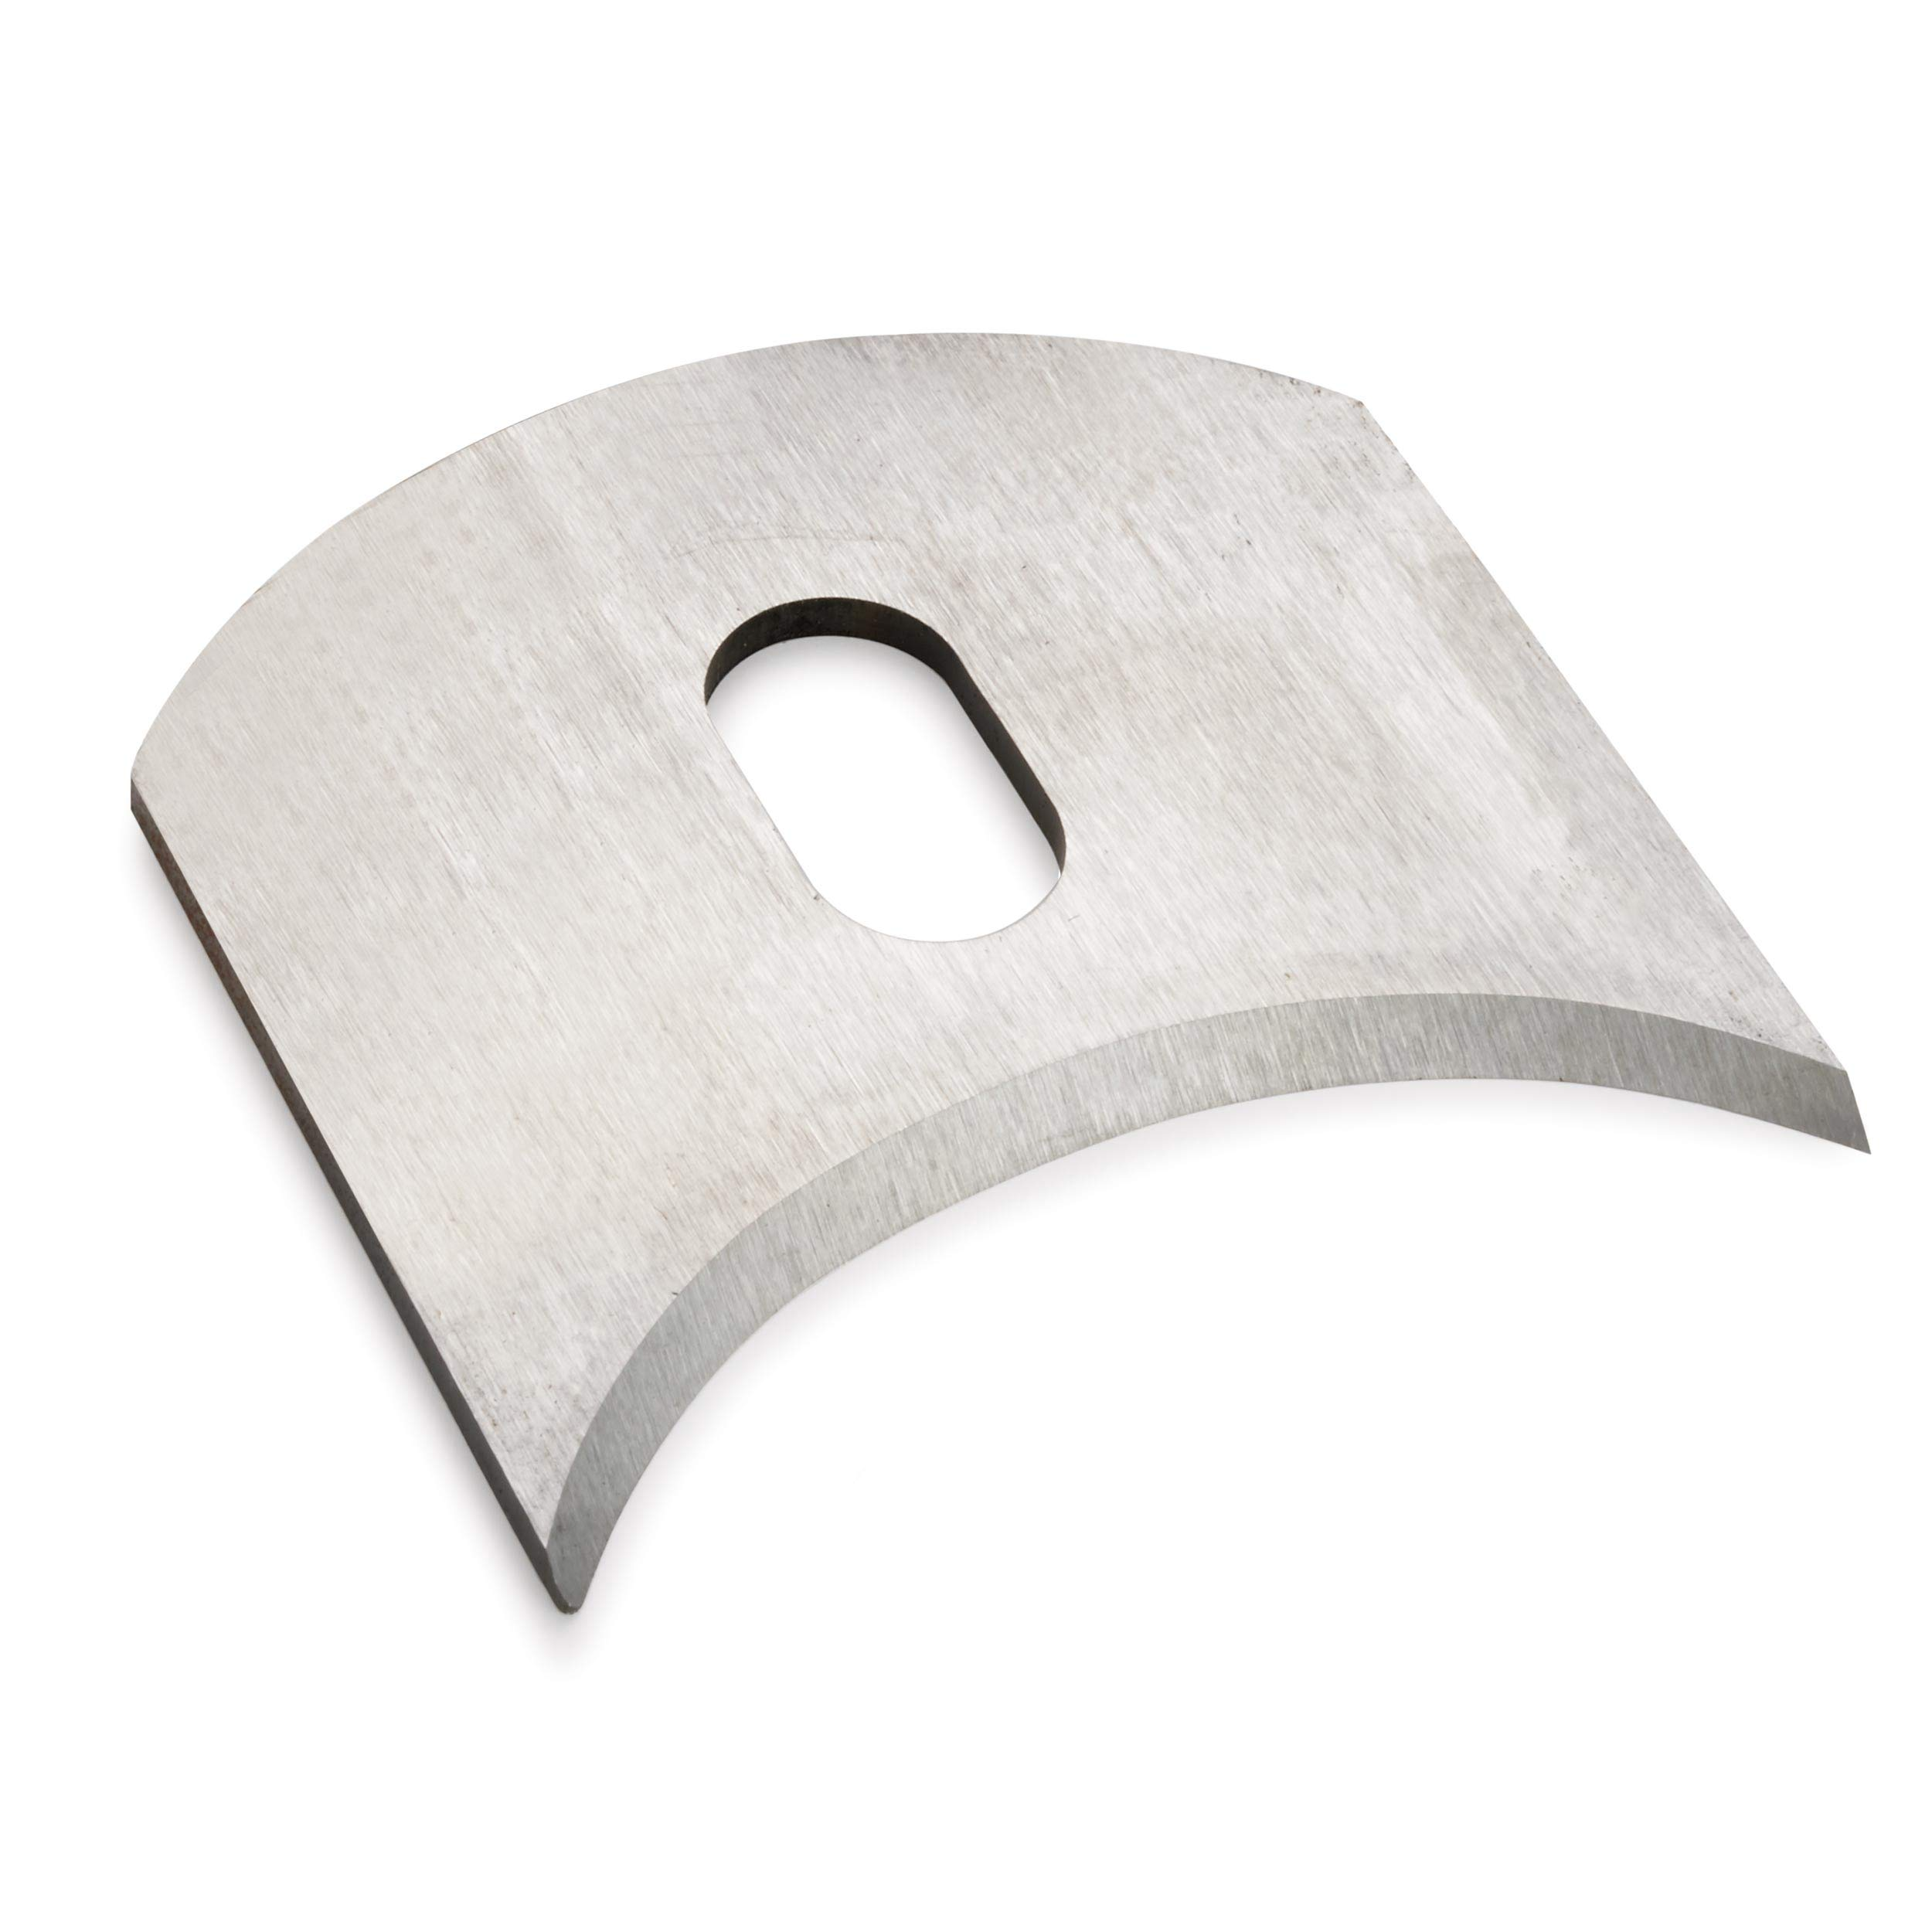 Spokeshave Replacement Blade, Half-Round